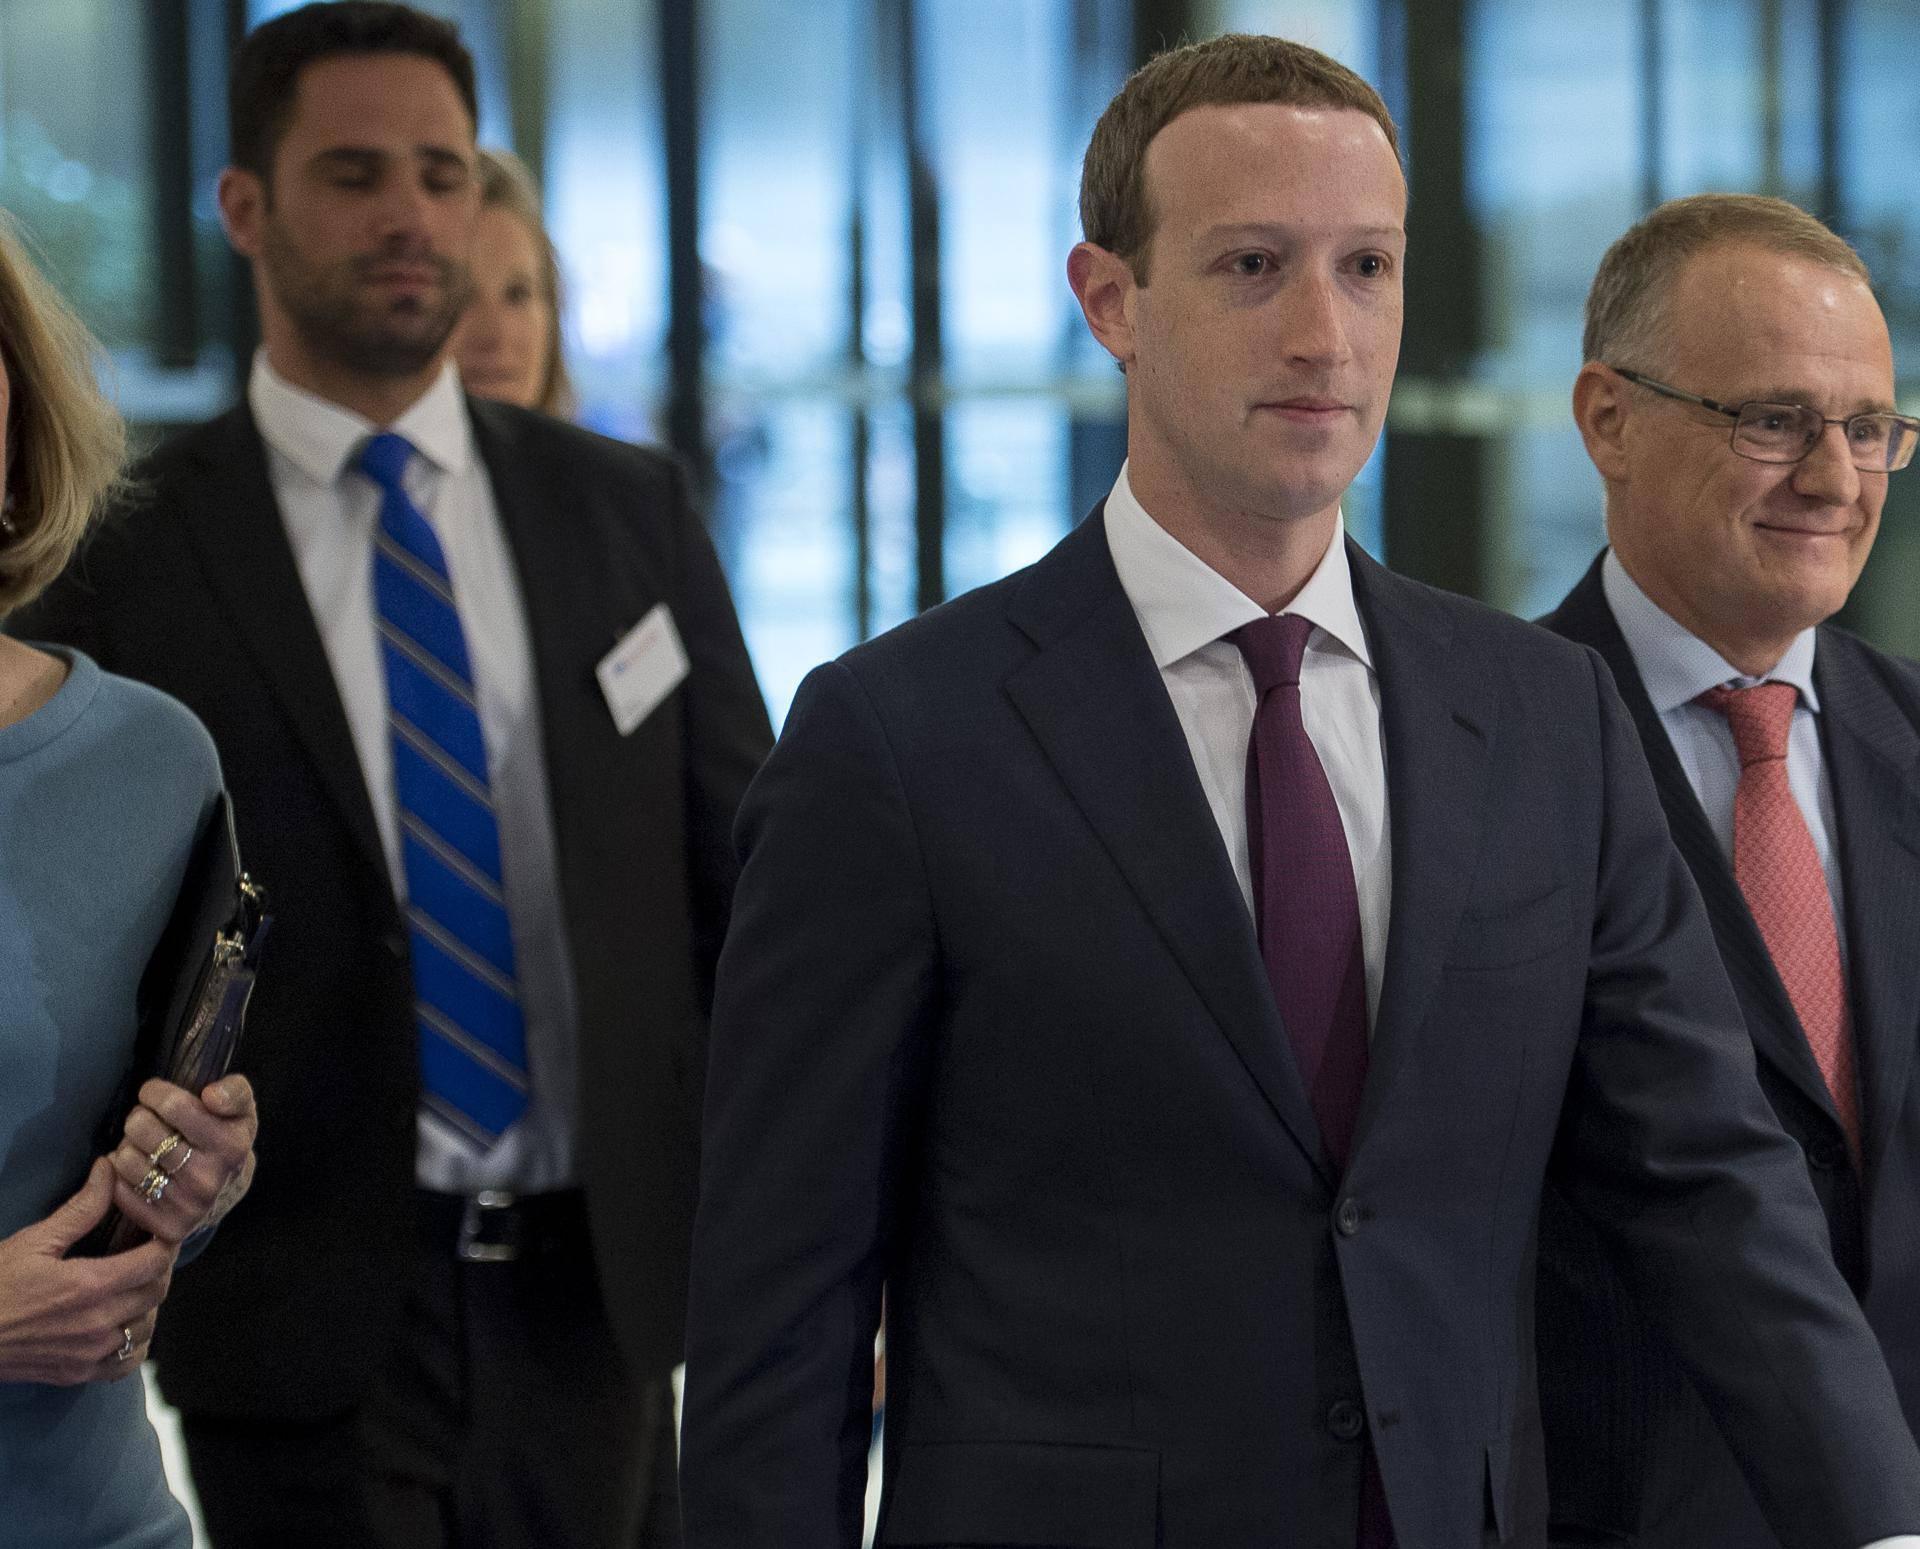 Mark Zuckerberg coming for the hearing ae European Parliament